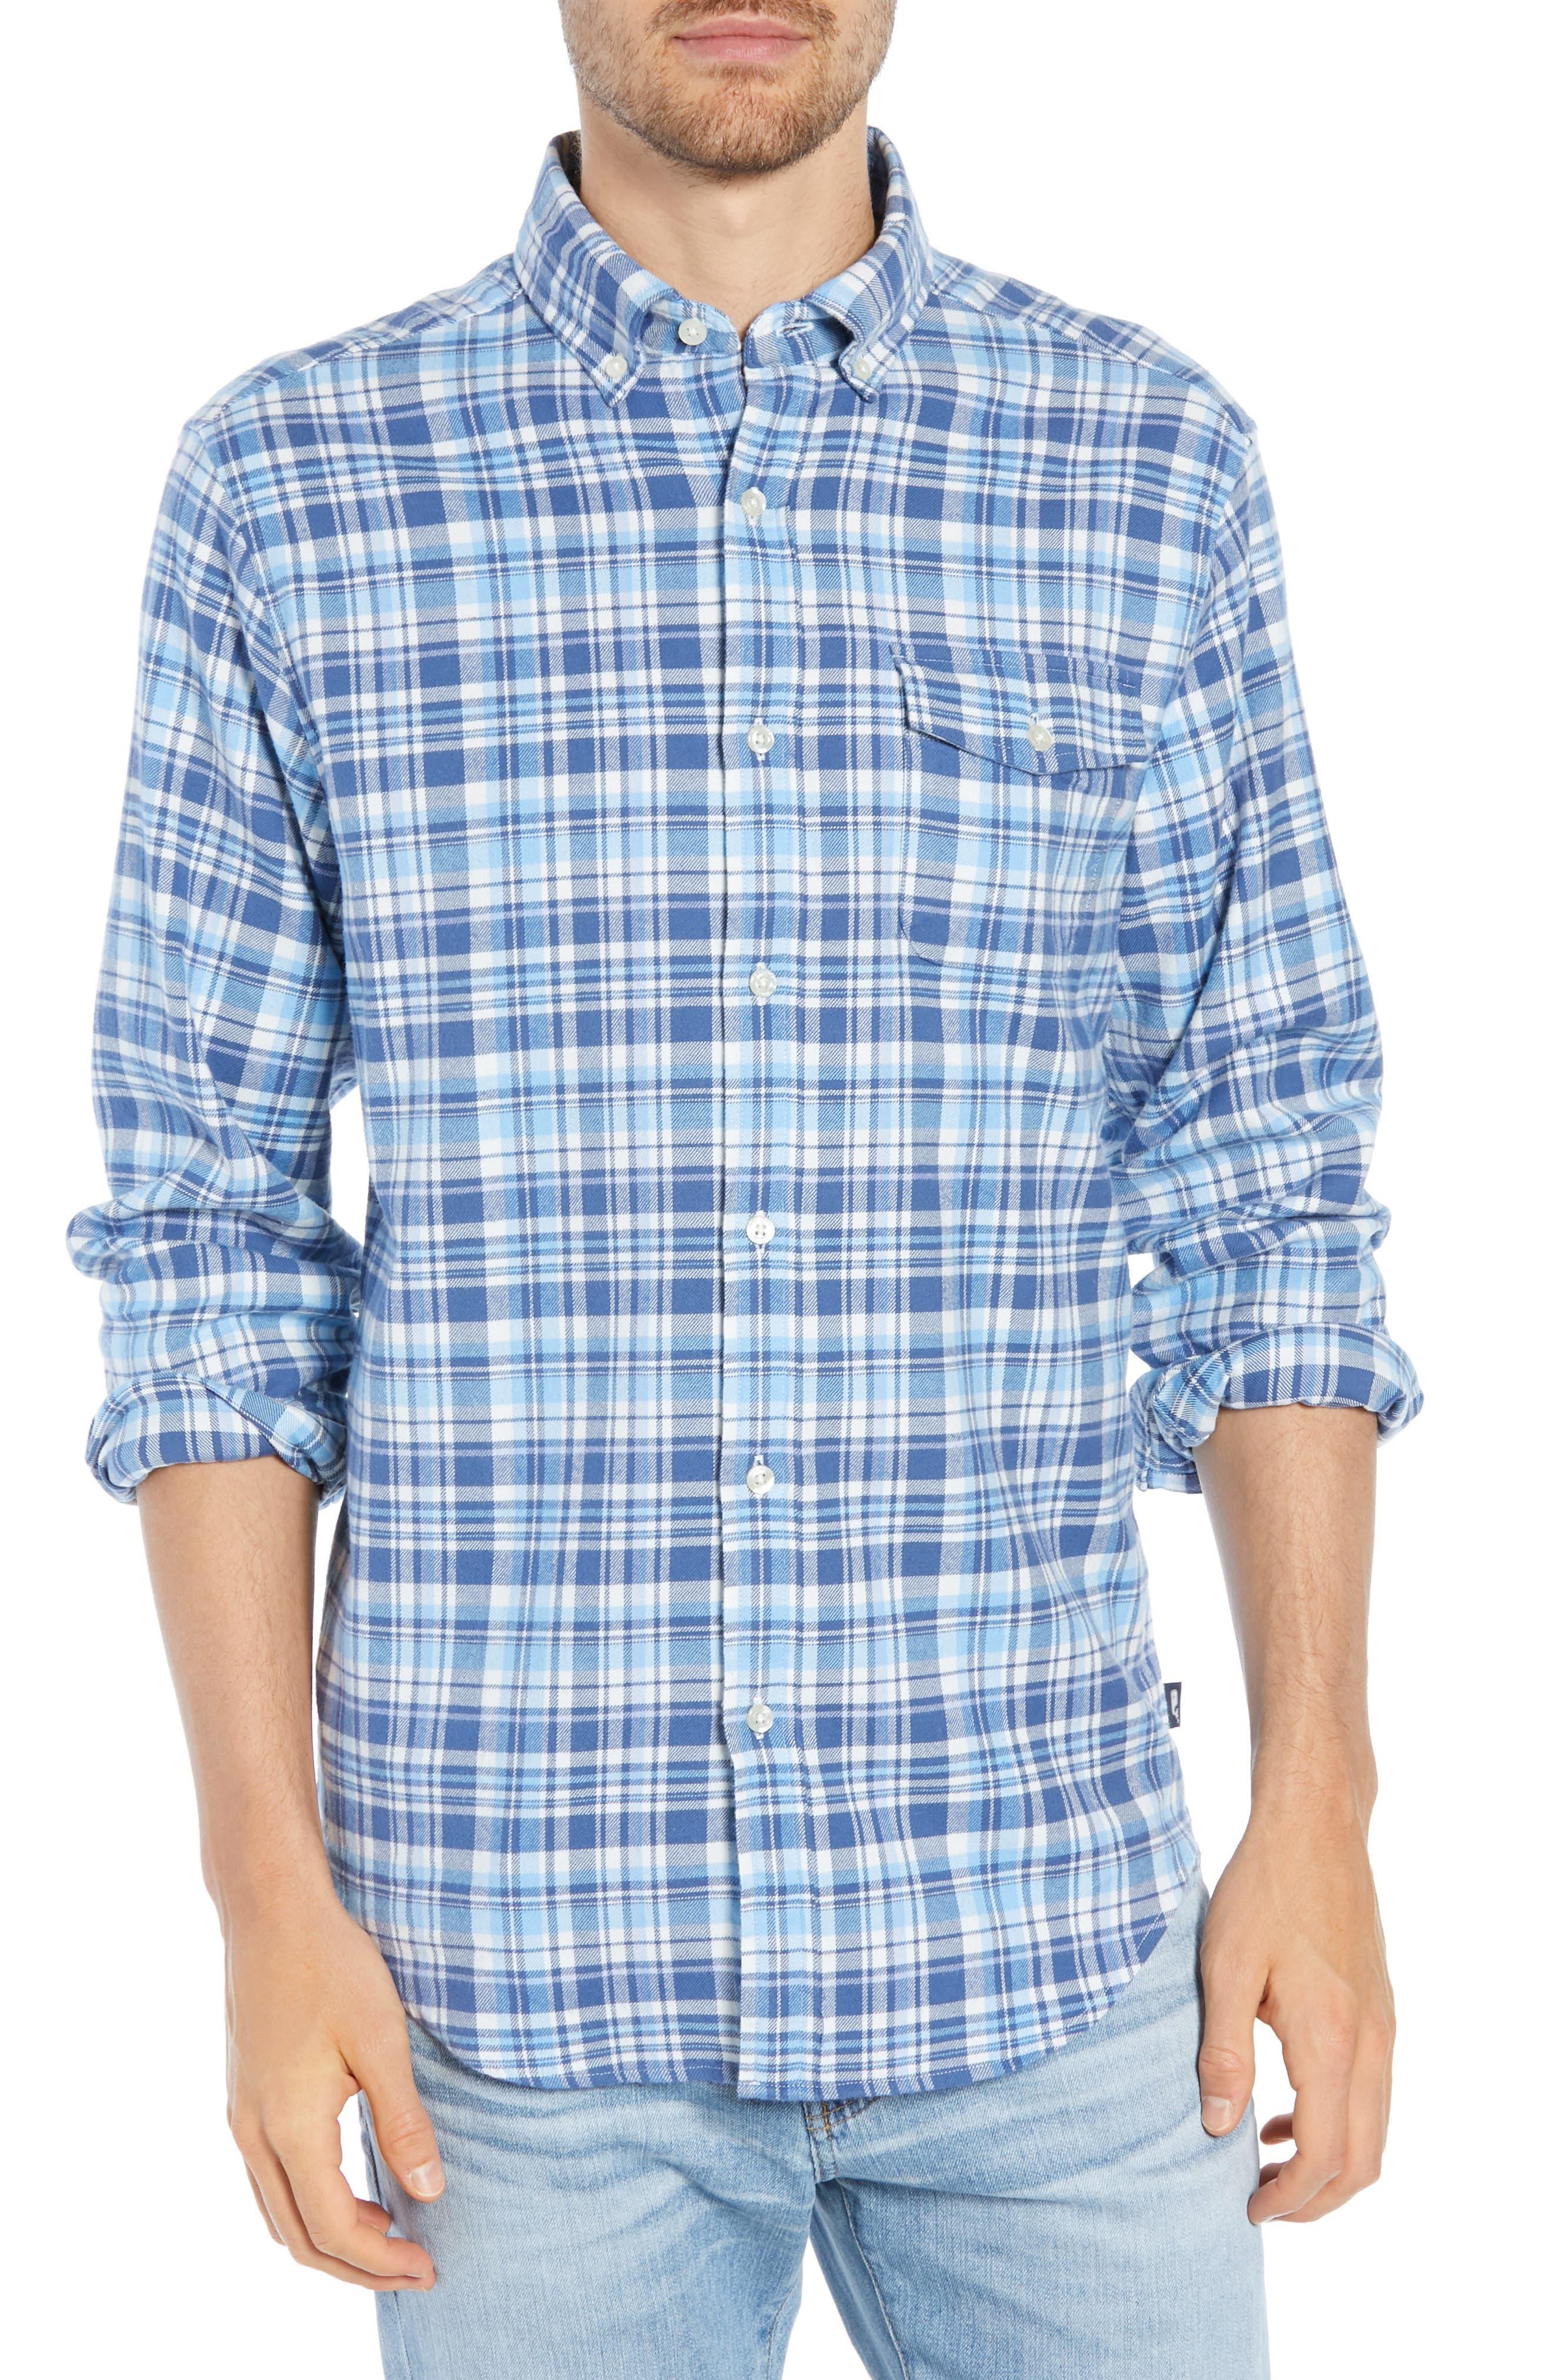 Mill Hill Regular Fit Plaid Flannel Shirt,                             Main thumbnail 1, color,                             MOONSHINE